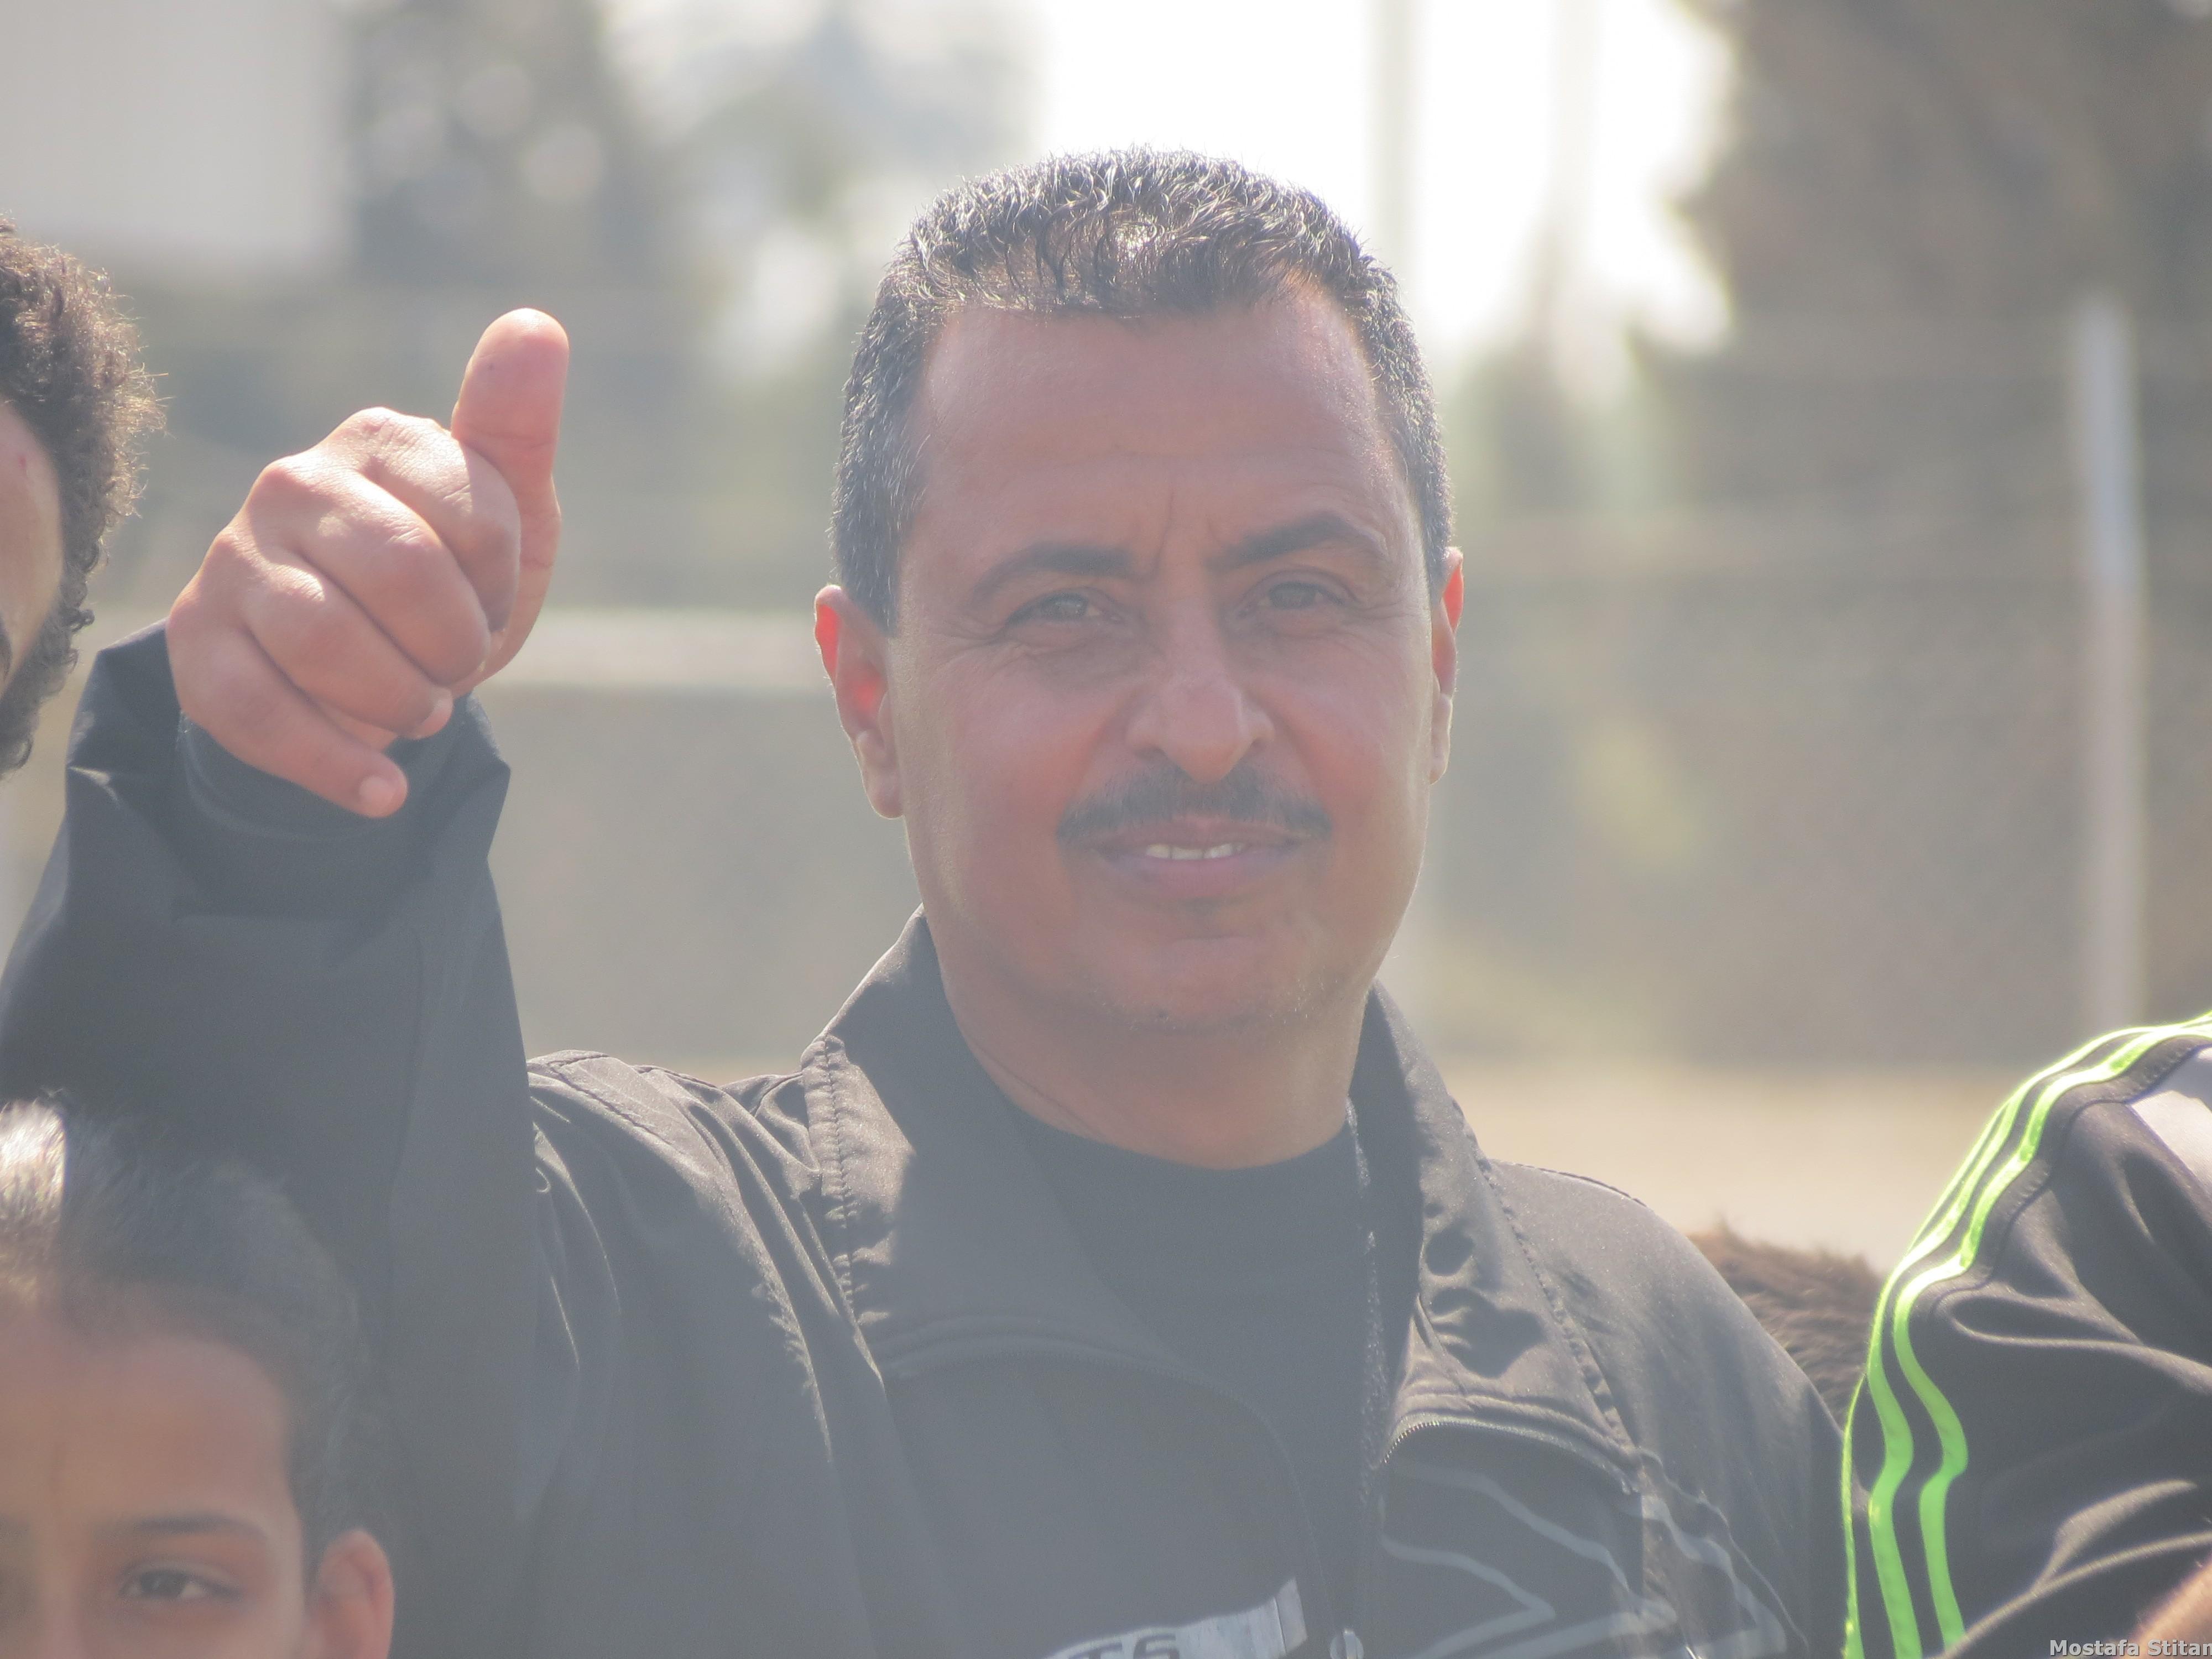 سمير النباهين